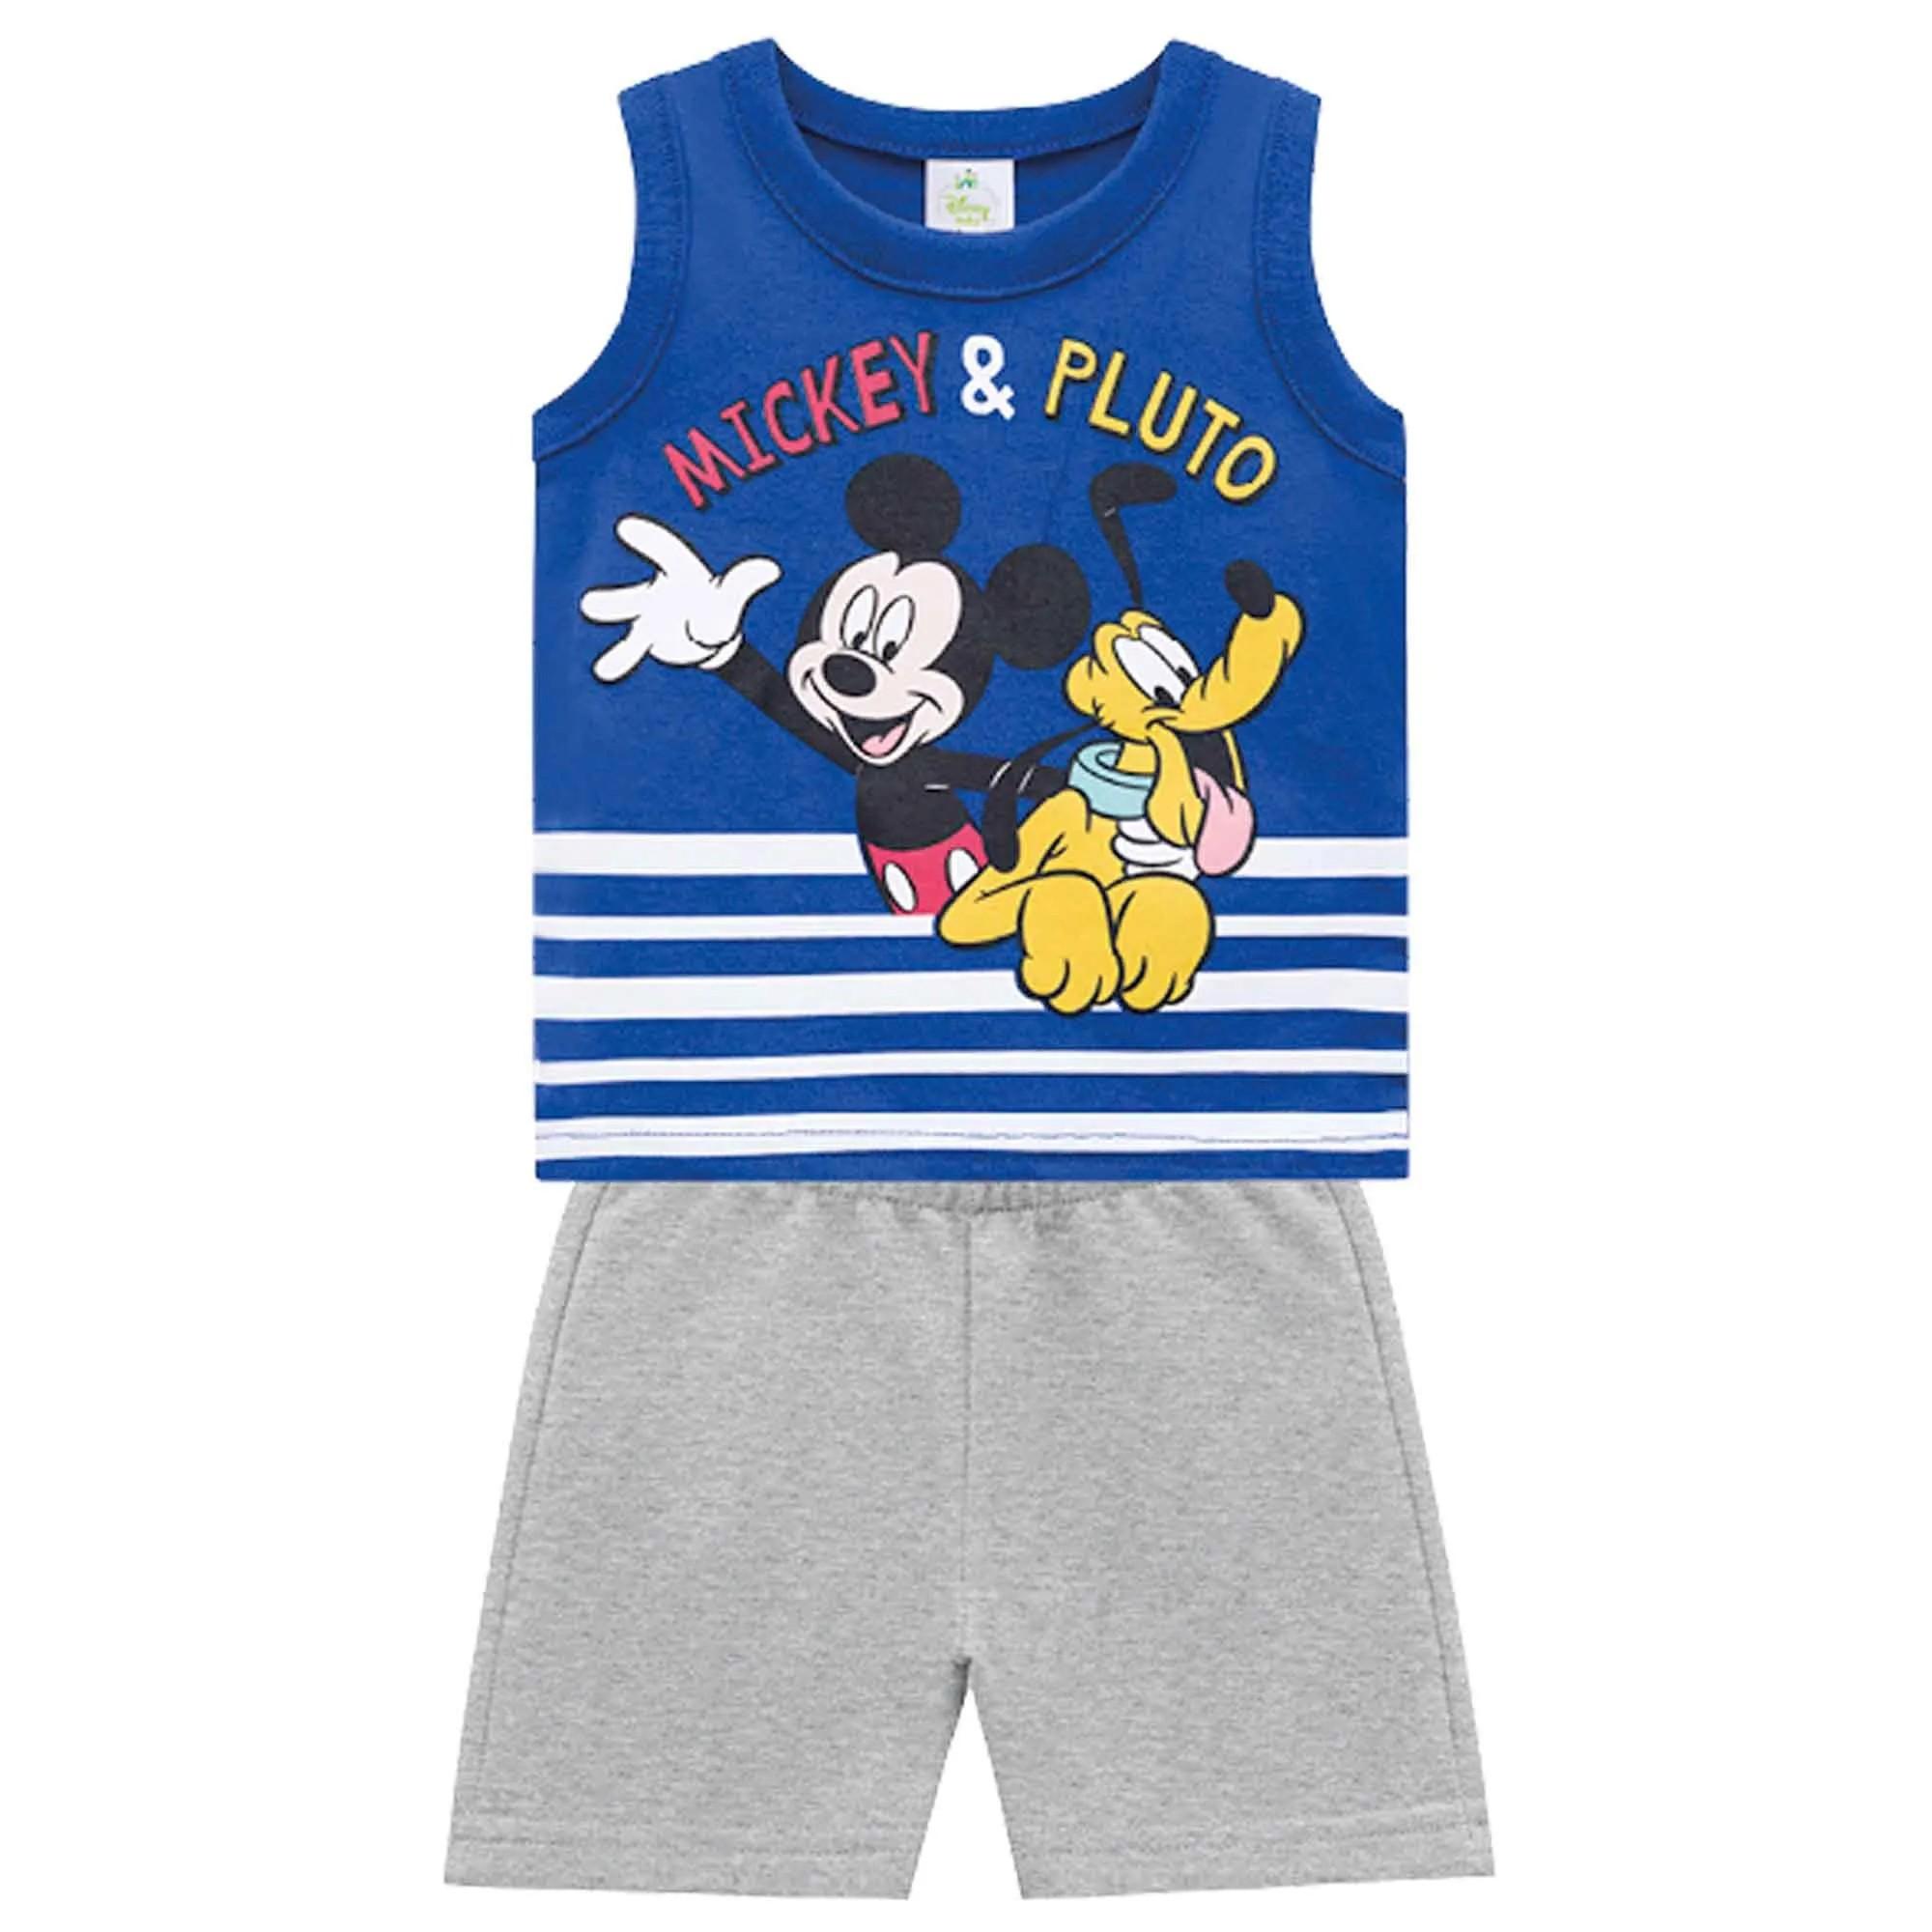 Conjunto Verão Brandili Baby Regata Mickey & Pluto com Bermuda Moletinho - P ao G